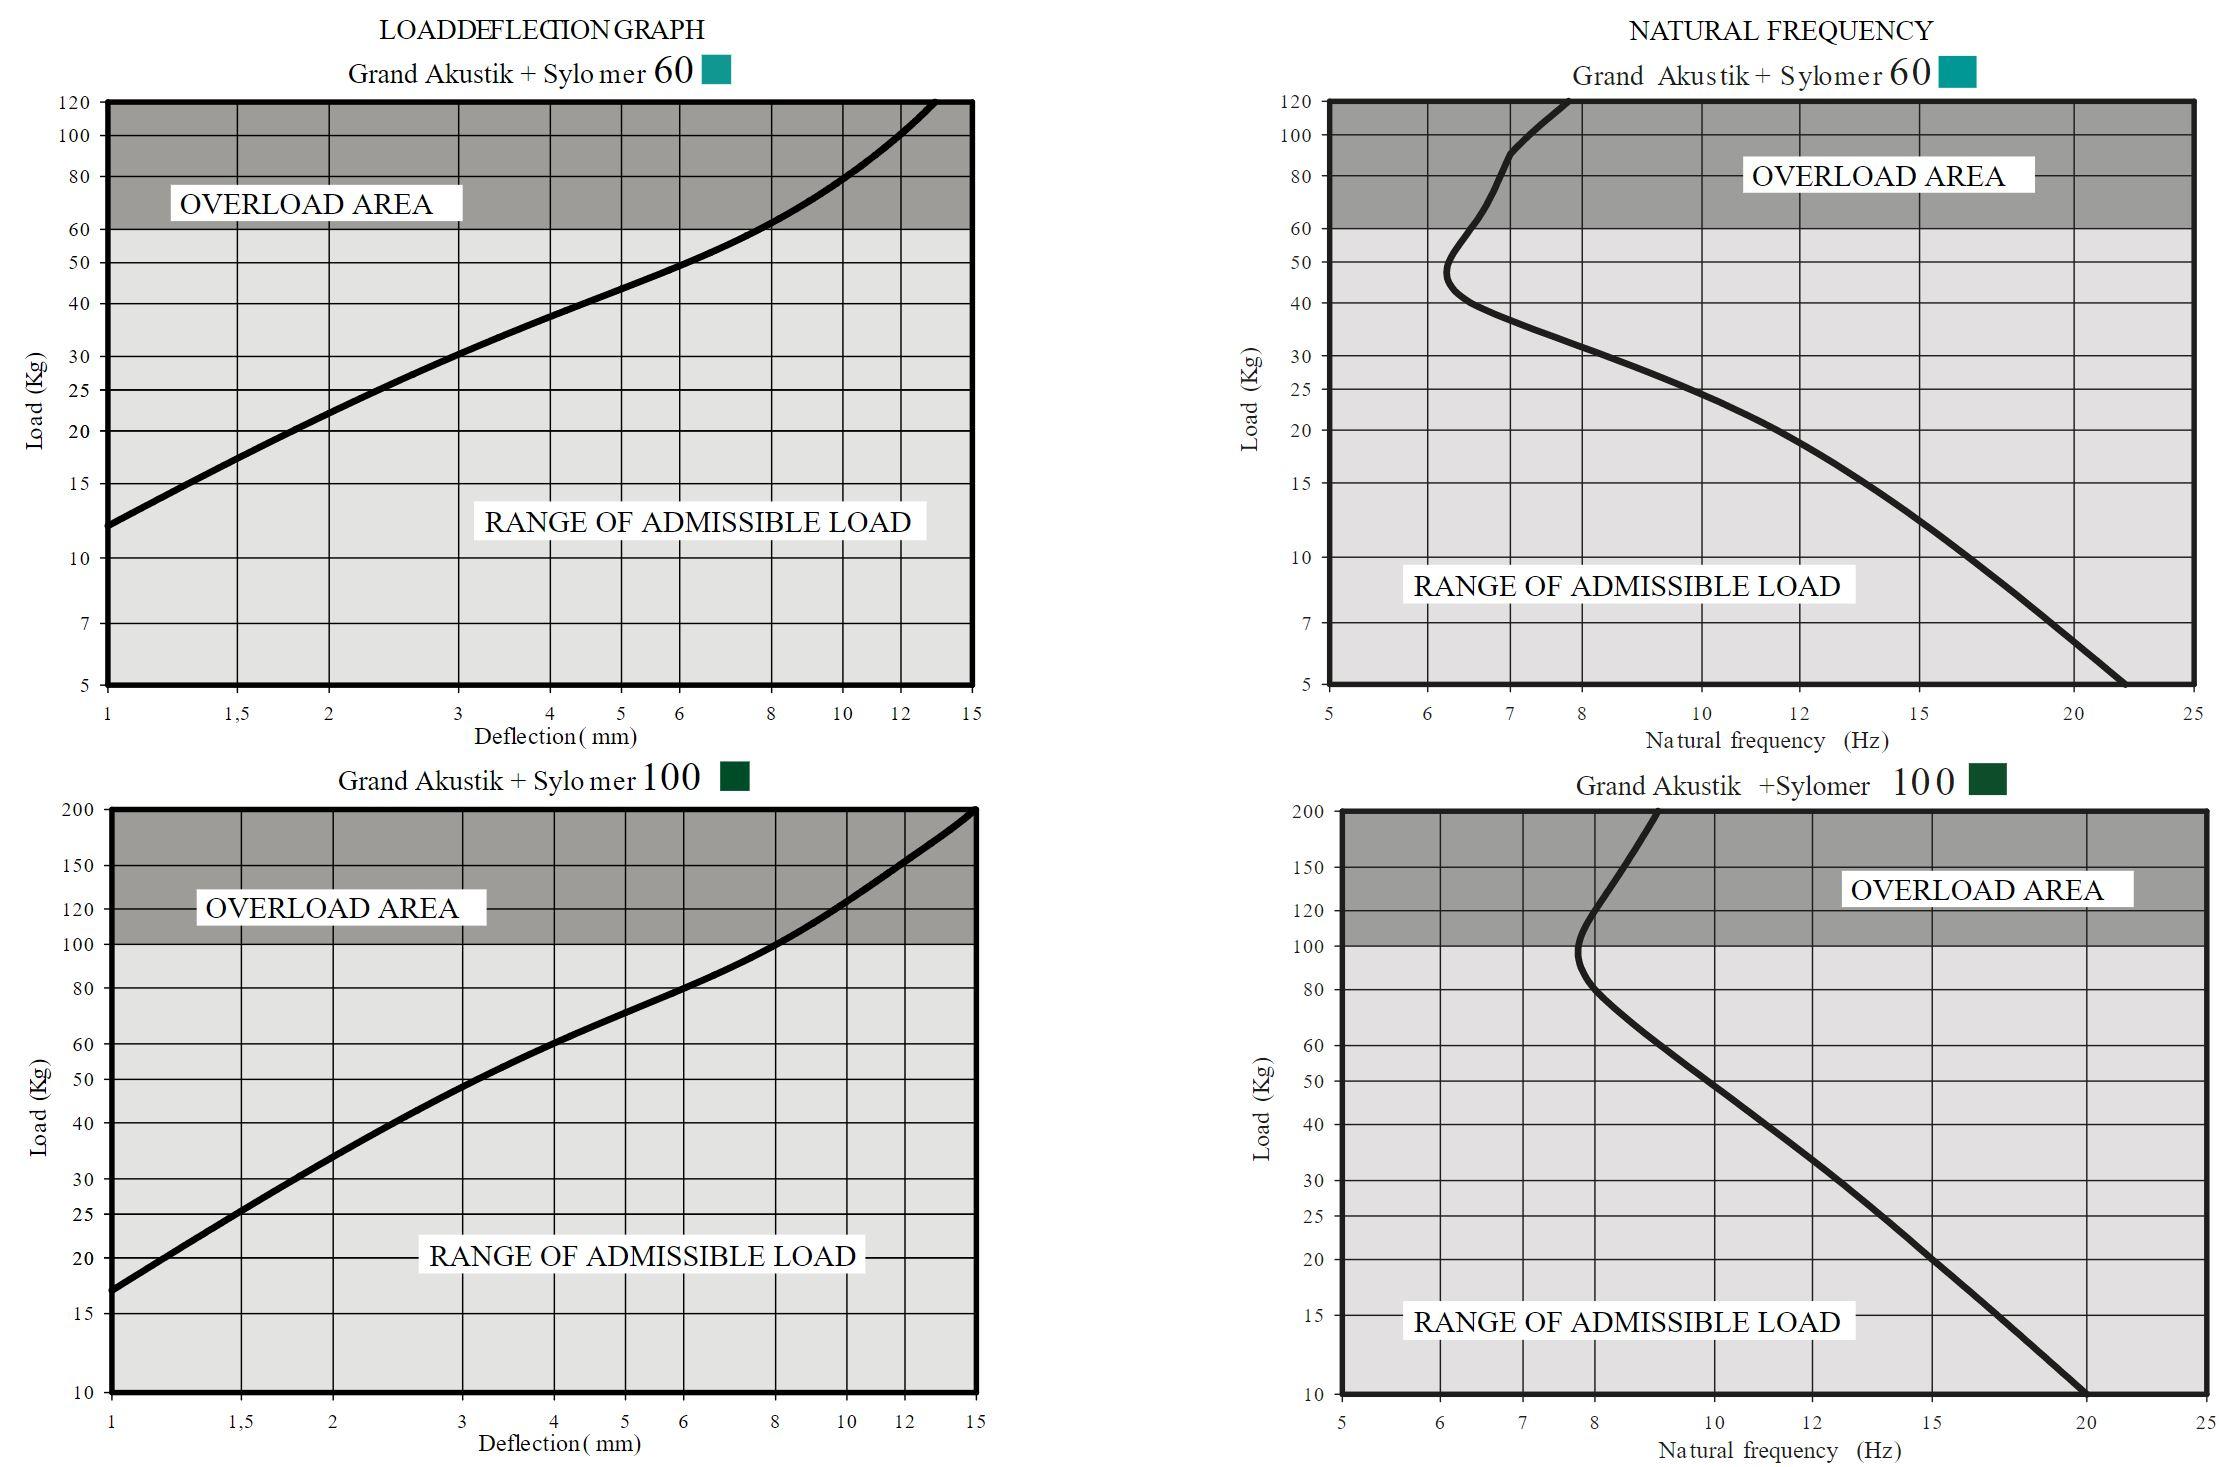 Grand Akustik 1 + Sylomer Curve 1